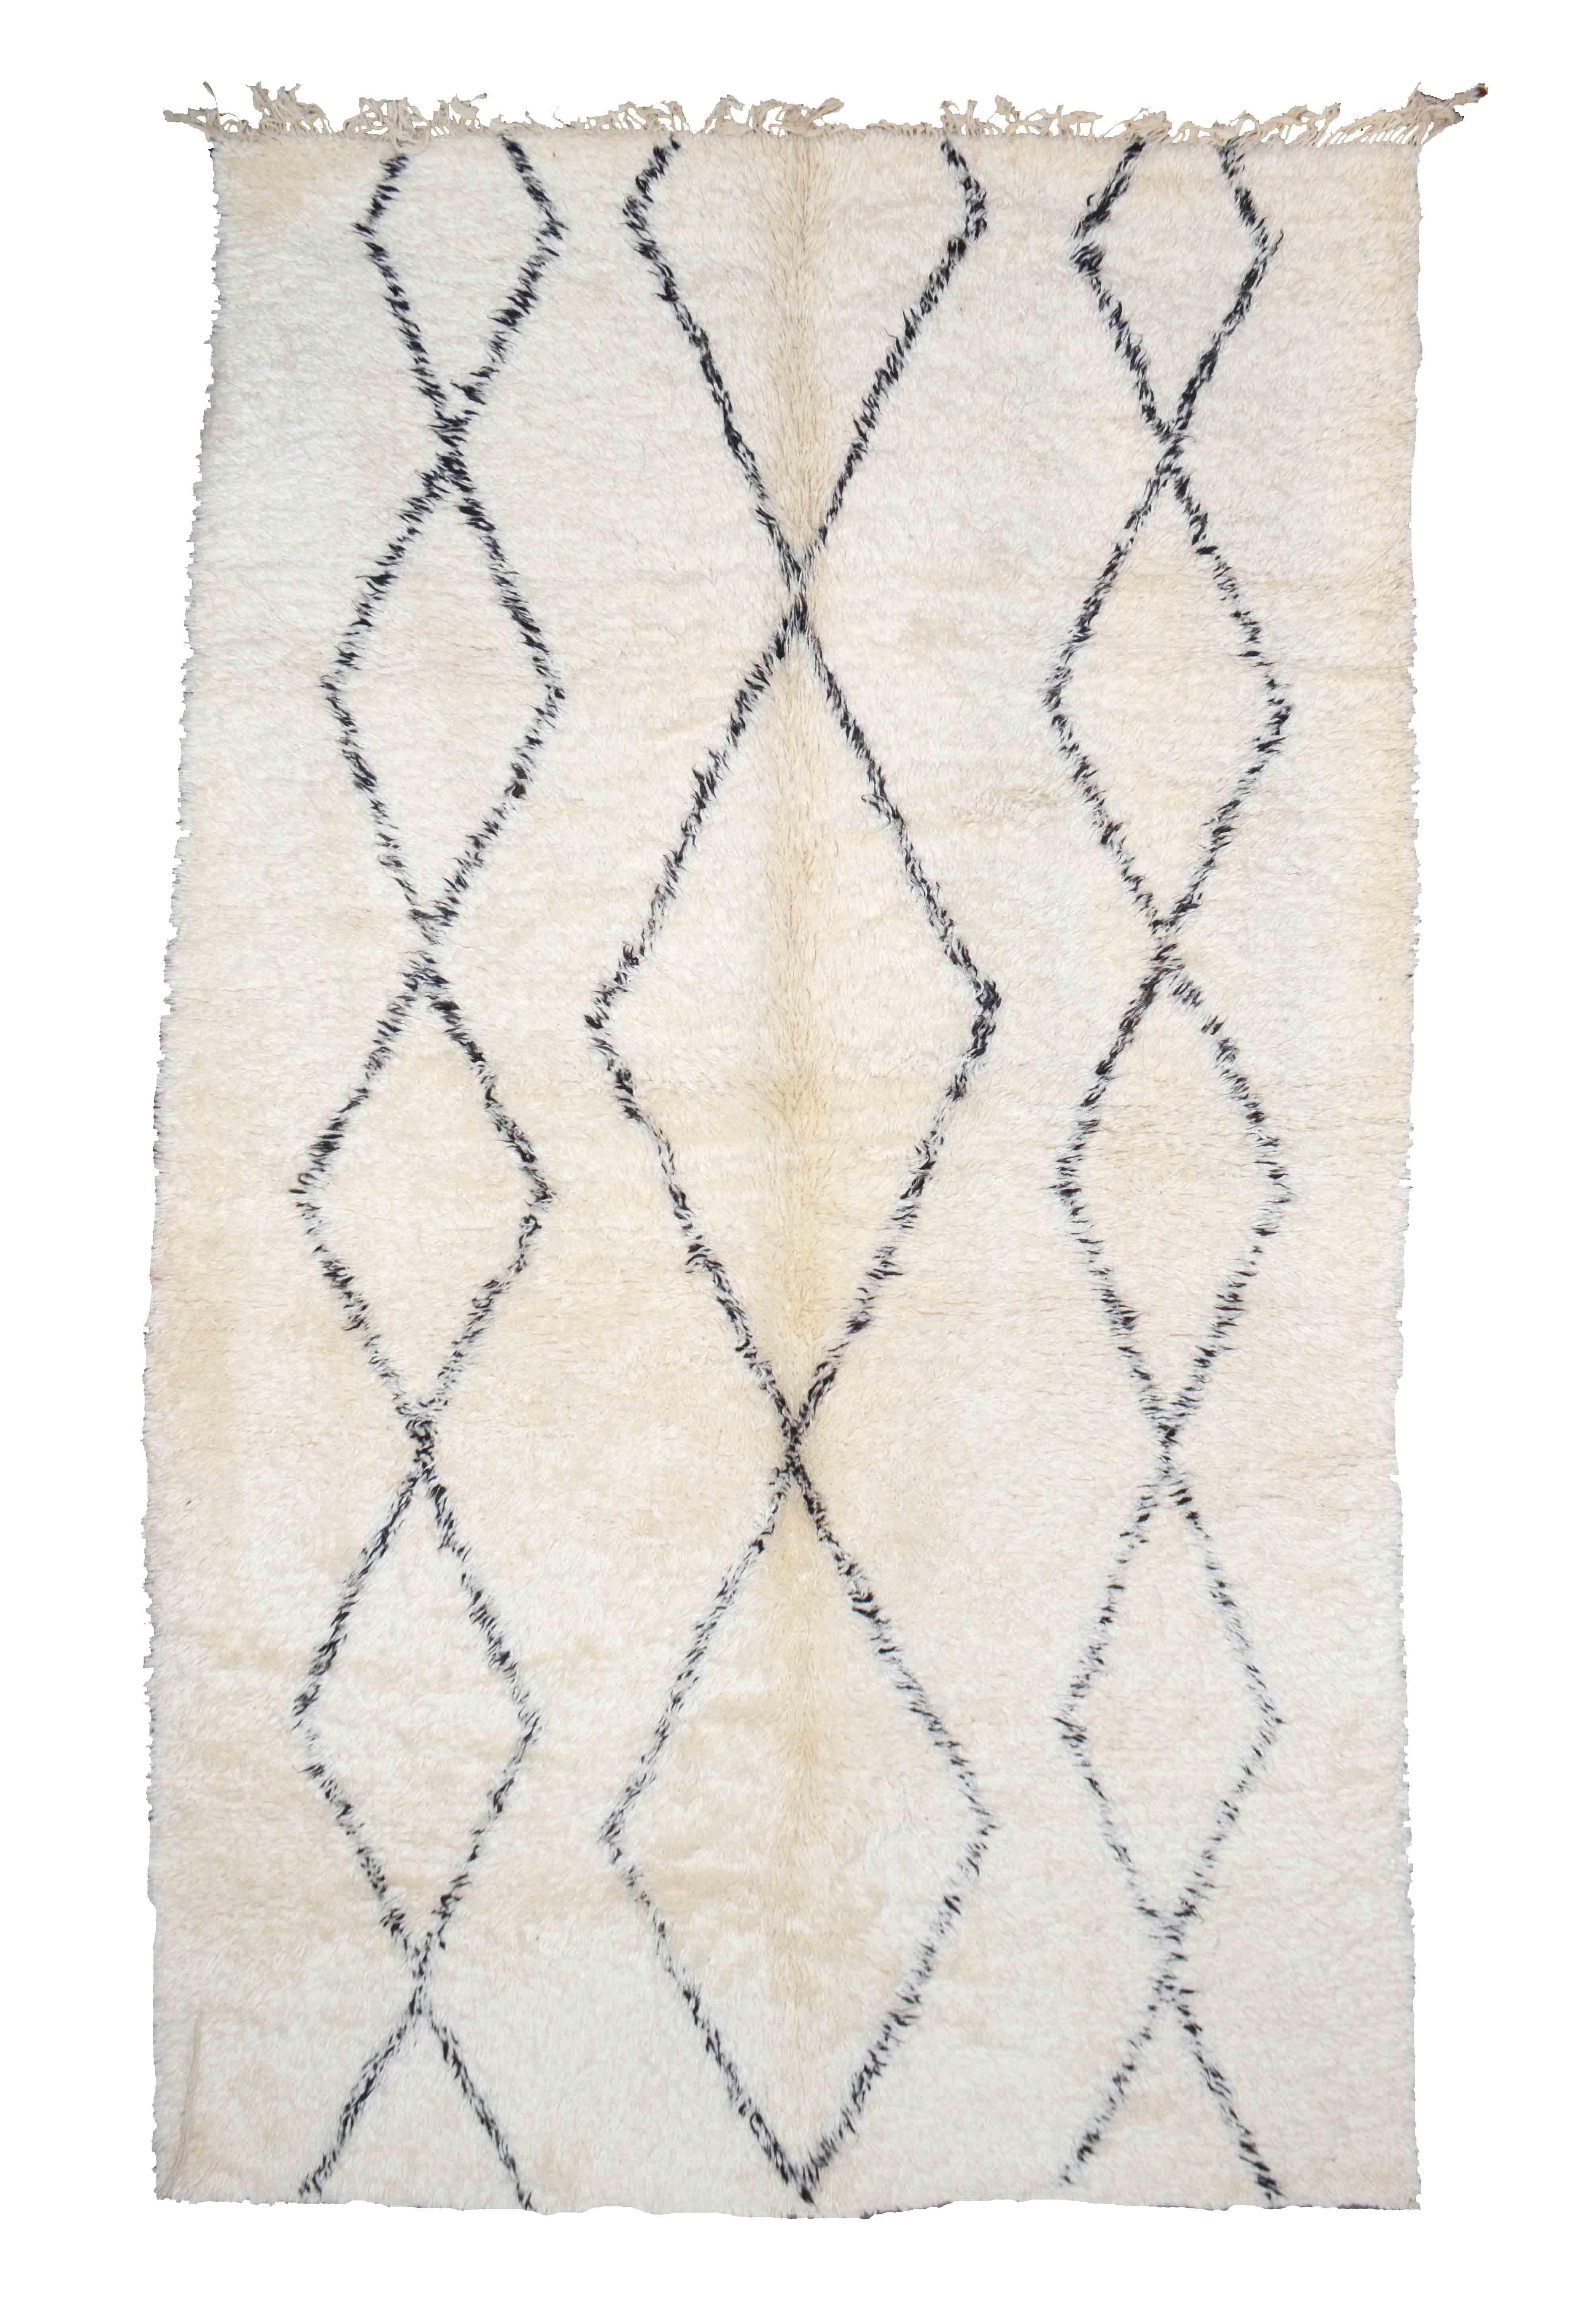 Beni Ourain BN06-21- 330 x 190 cm